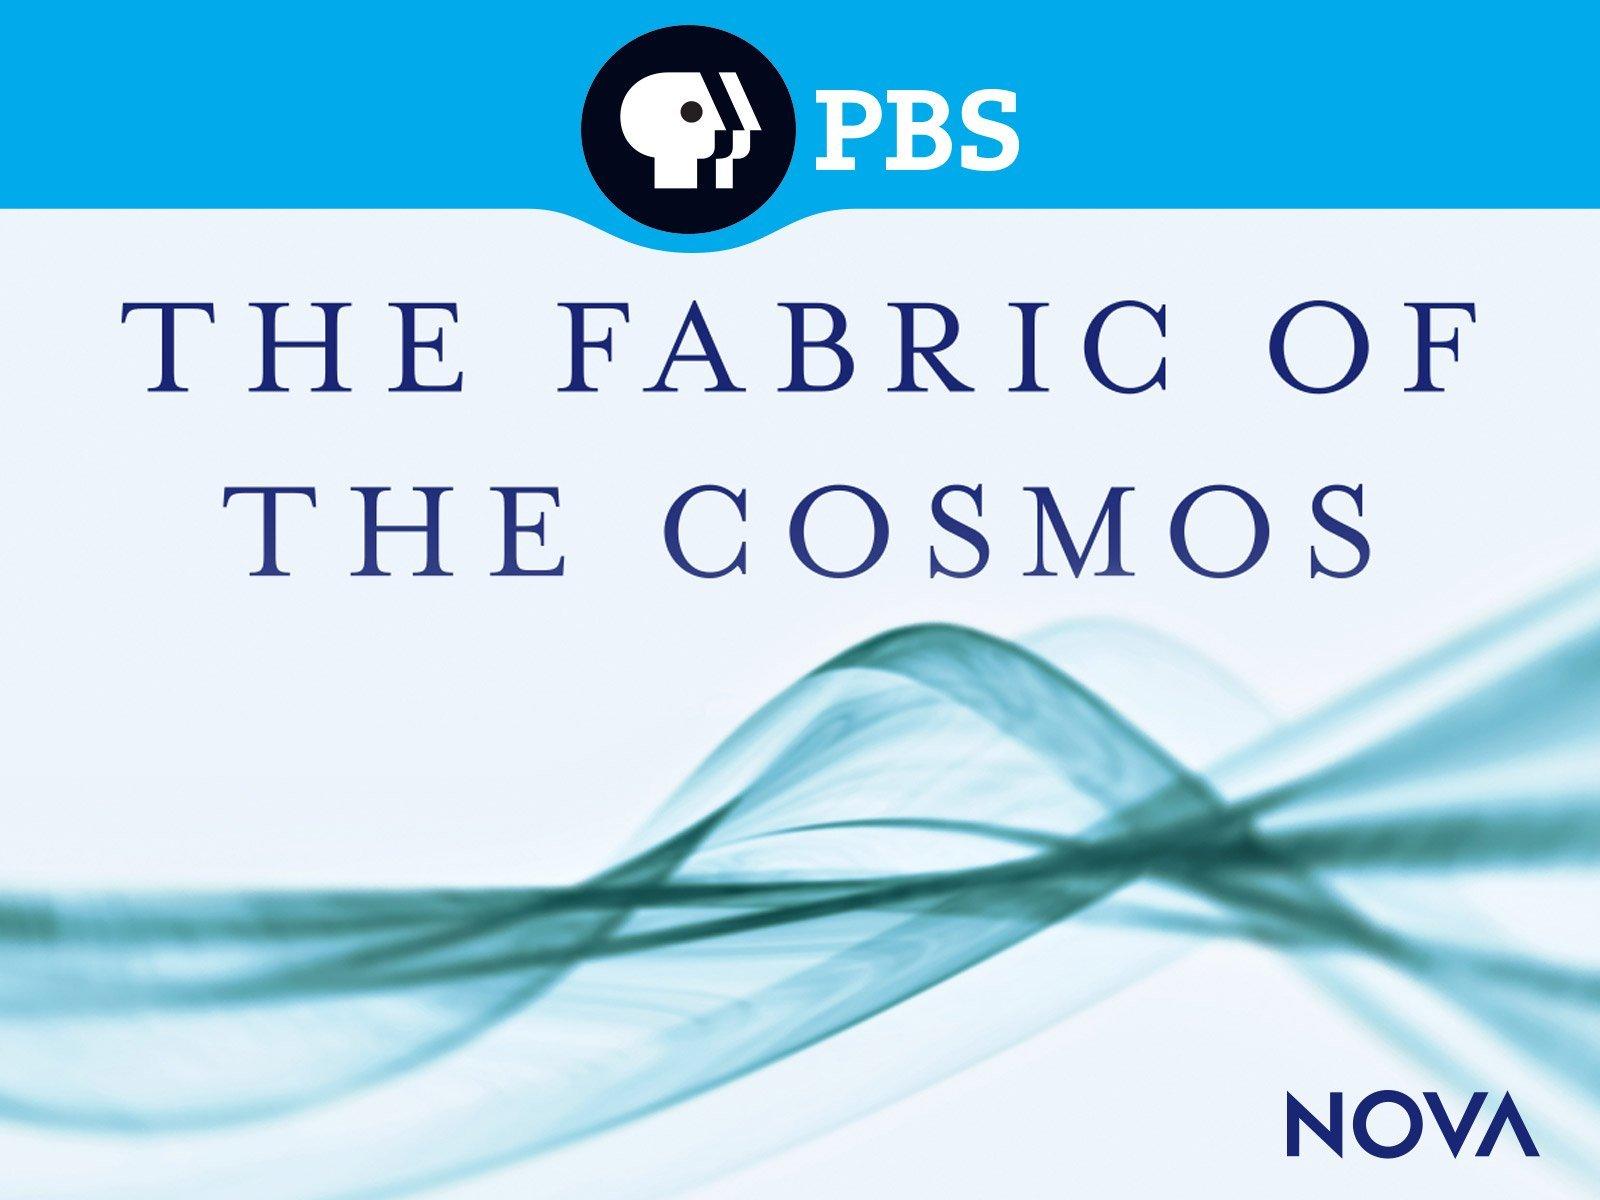 Amazoncom Watch Nova The Fabric Of The Cosmos Prime Video